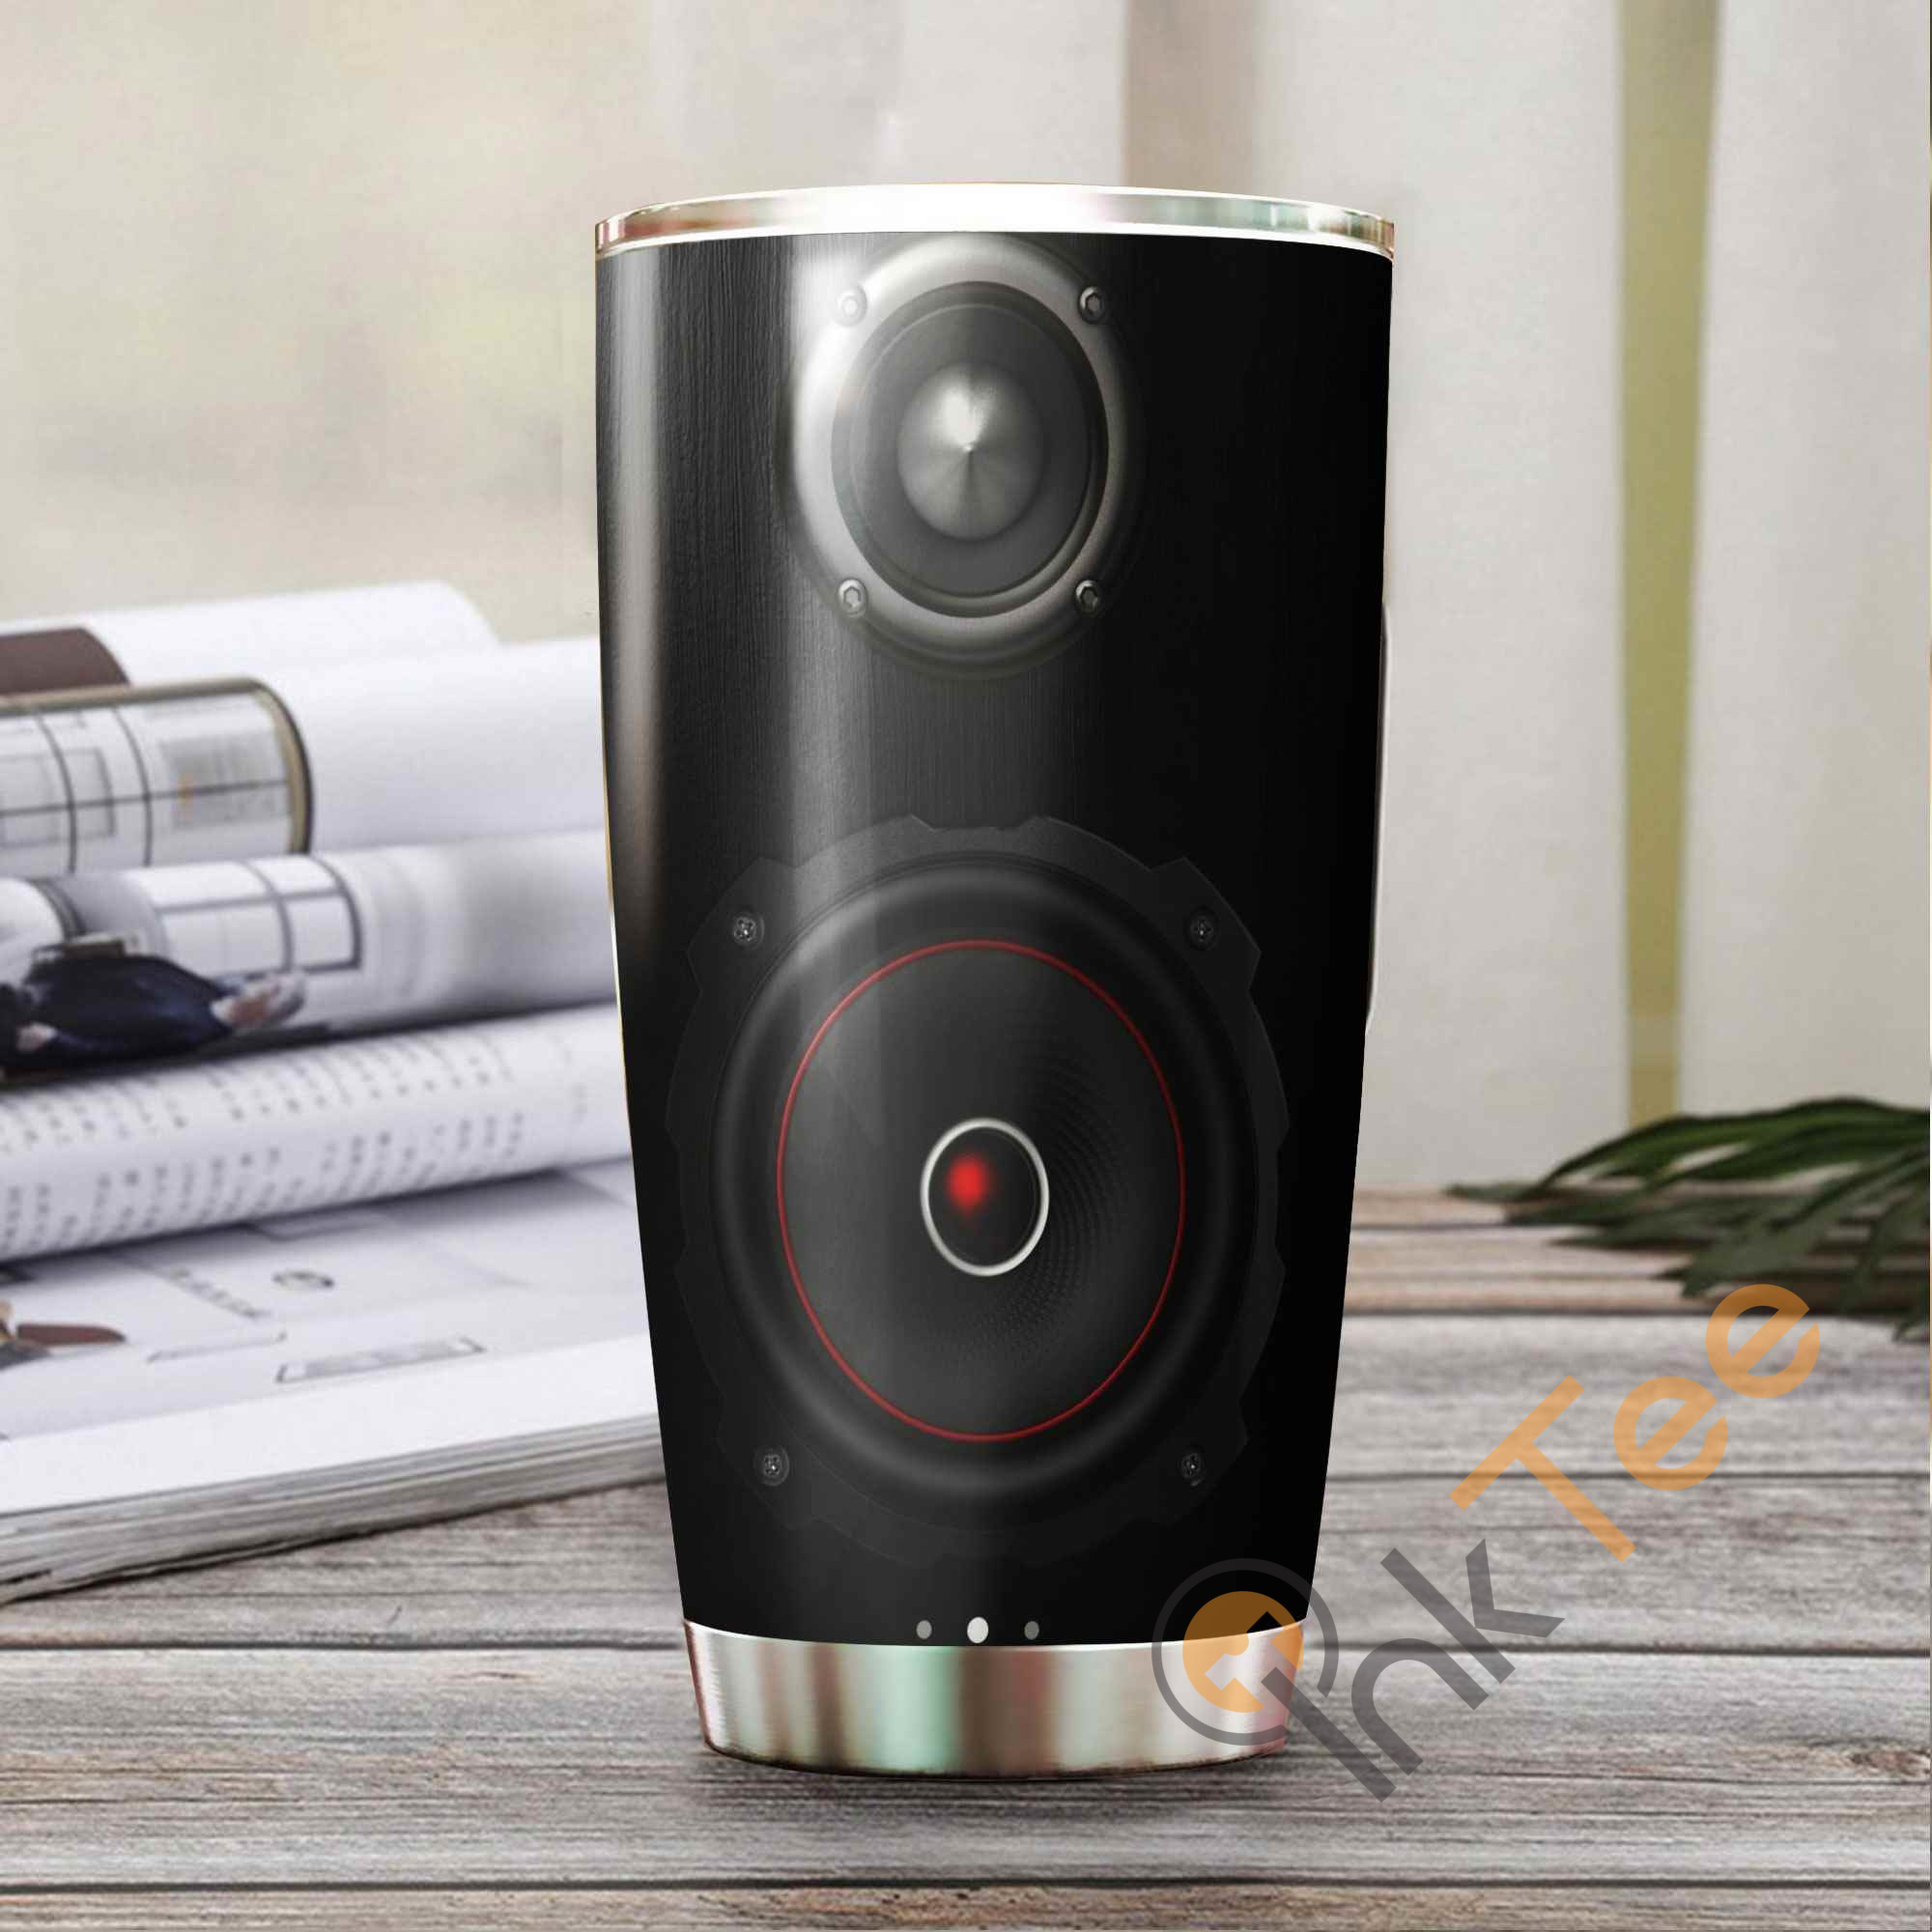 Beautiful Speaker Amazon Best Seller Sku 3563 Stainless Steel Tumbler